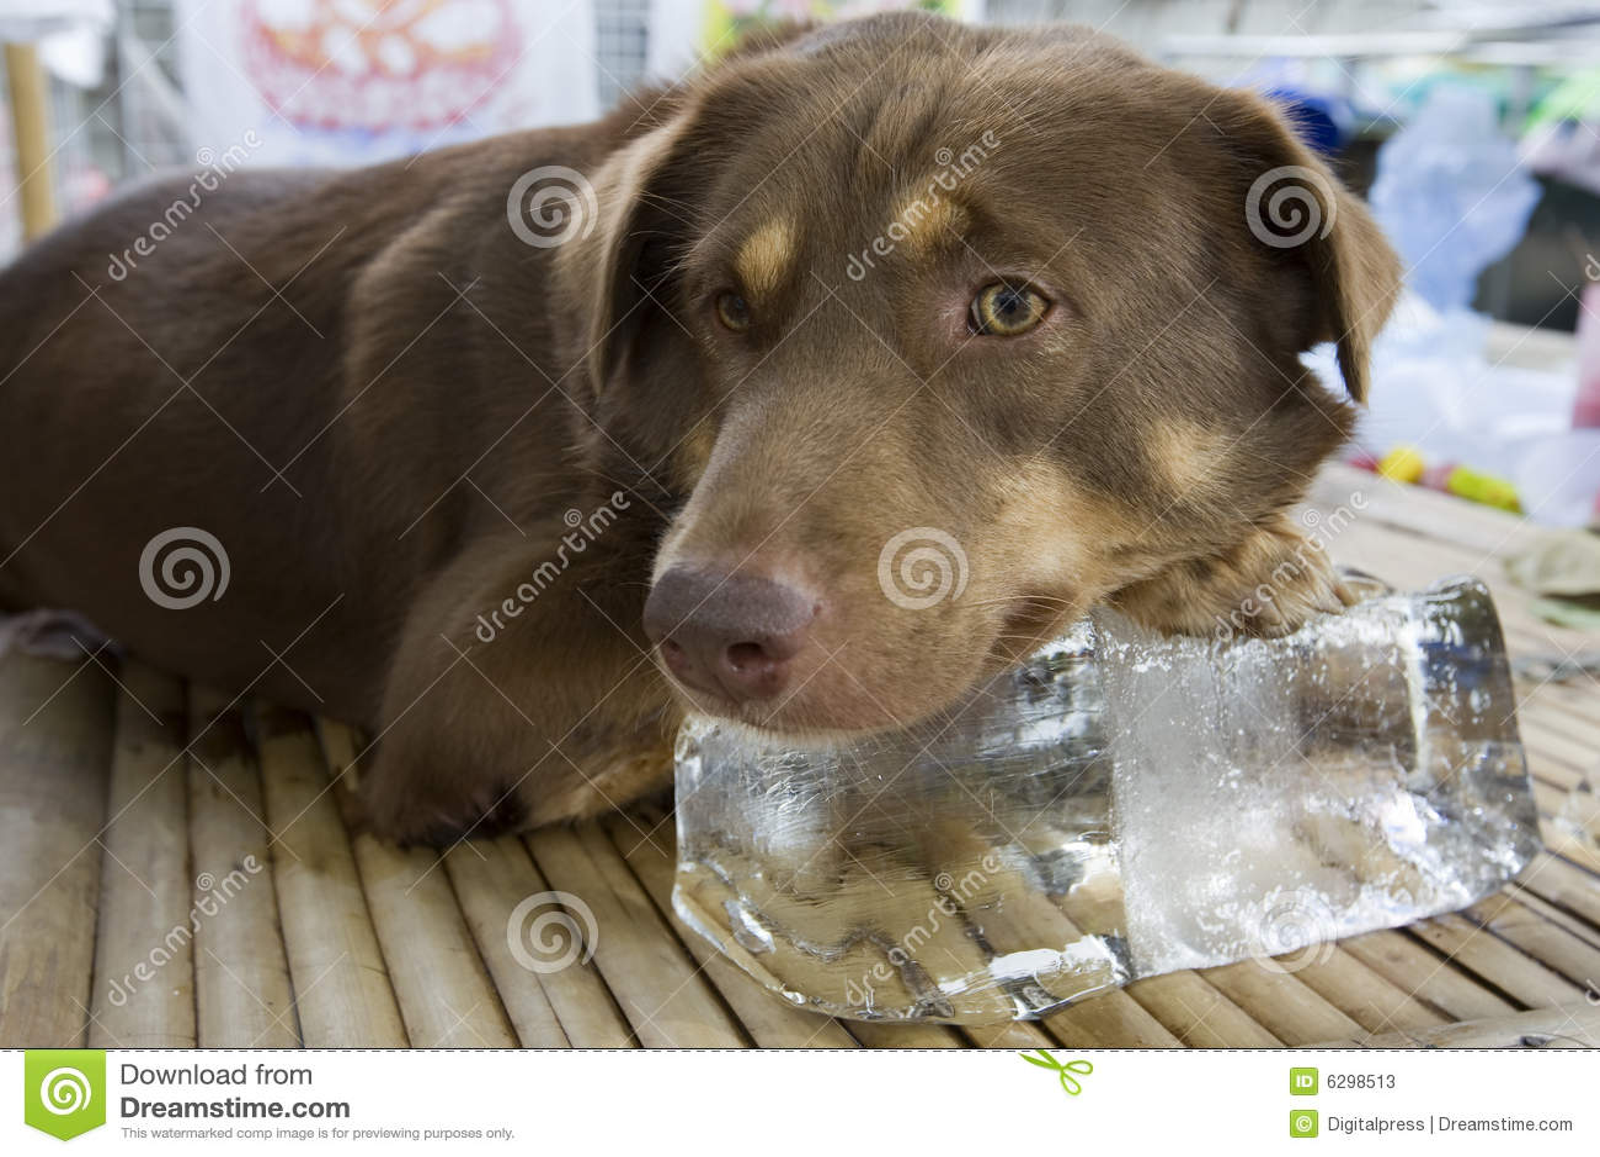 Dog on block of ice